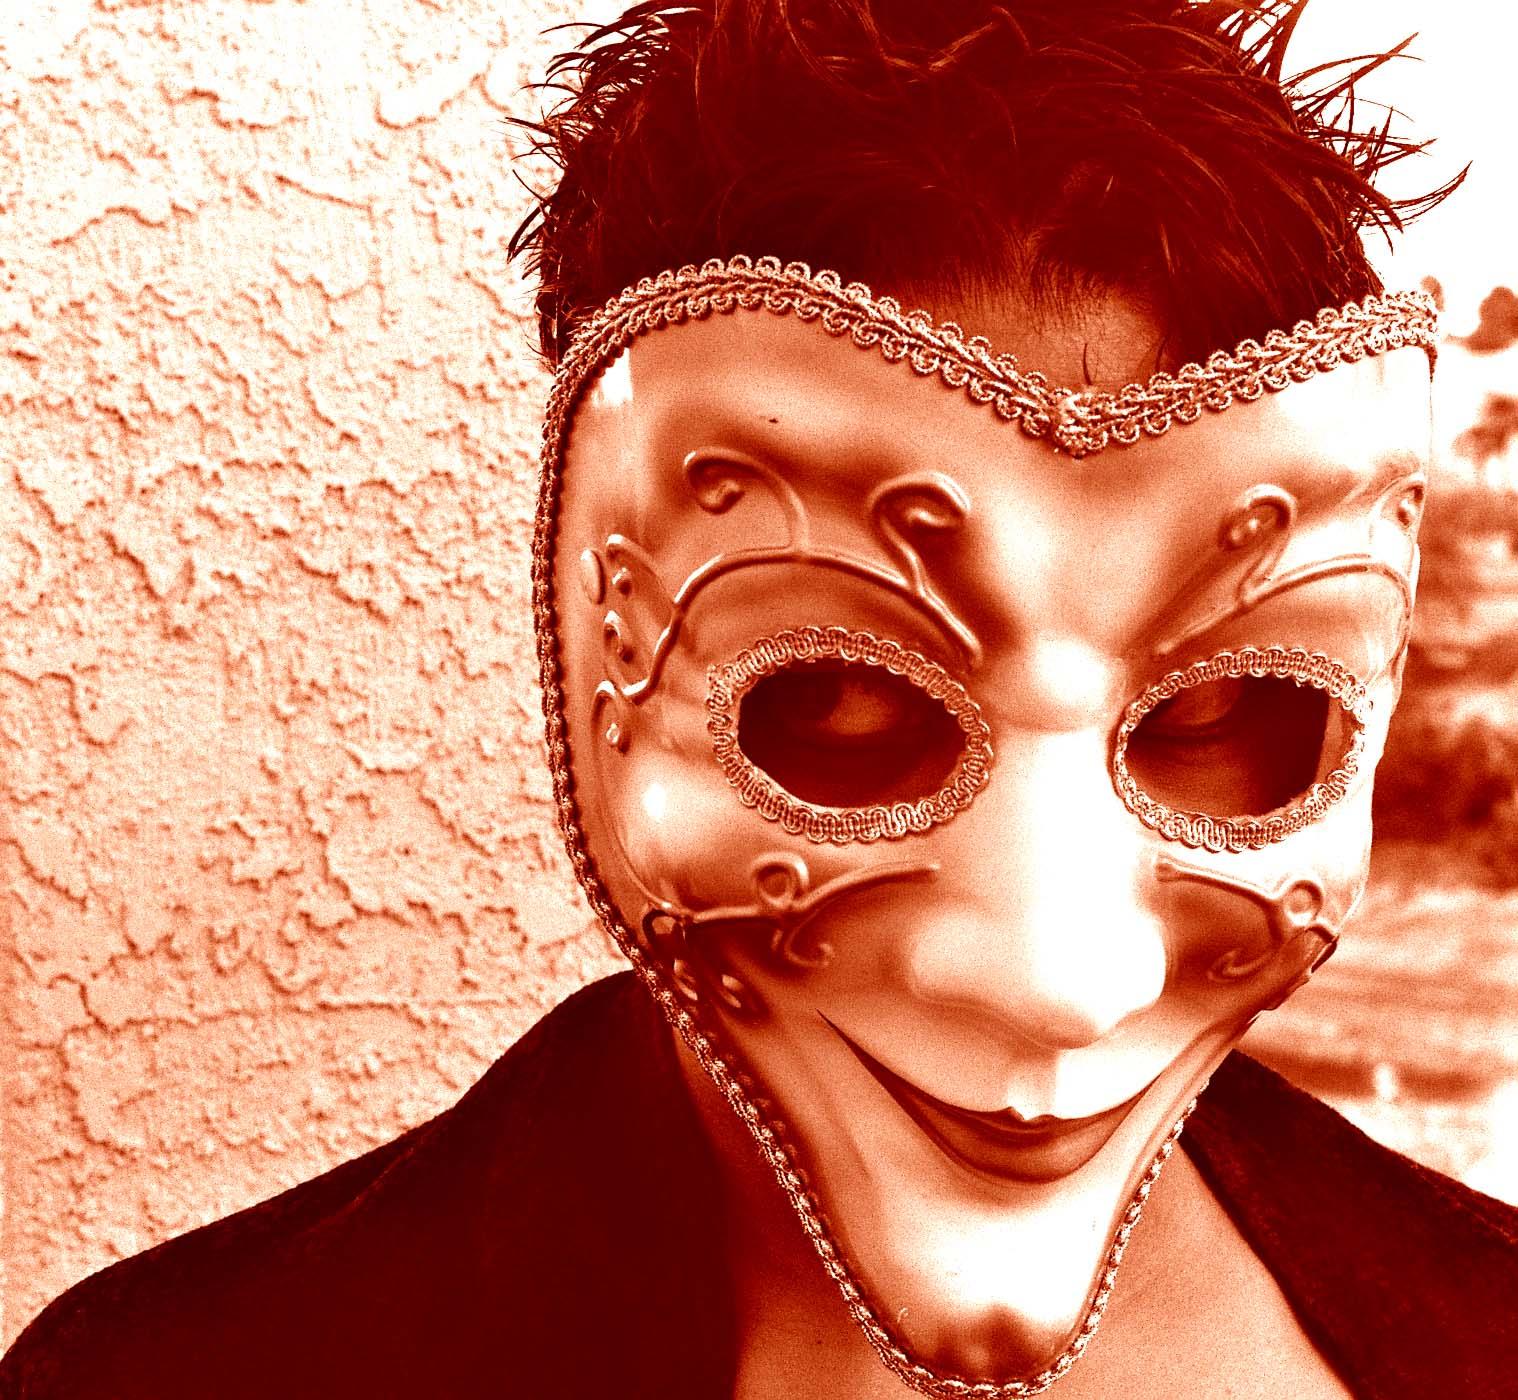 jacy-jester-no-7